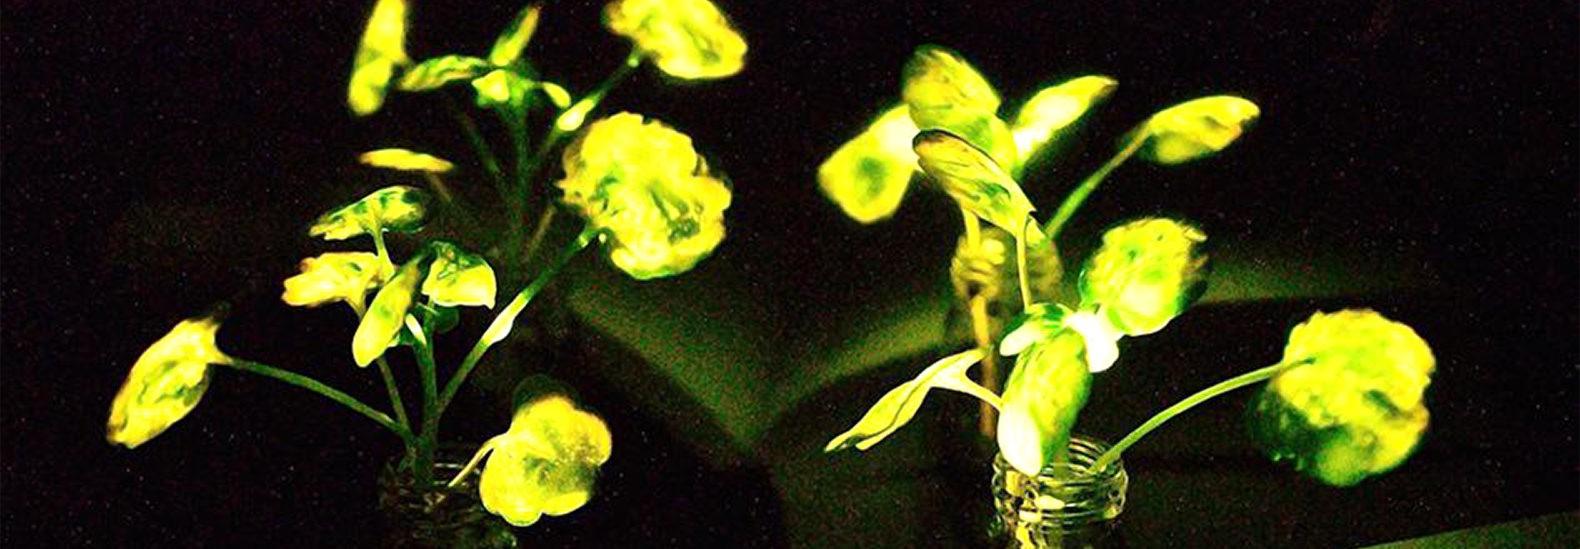 parlayan canlı bitkiler